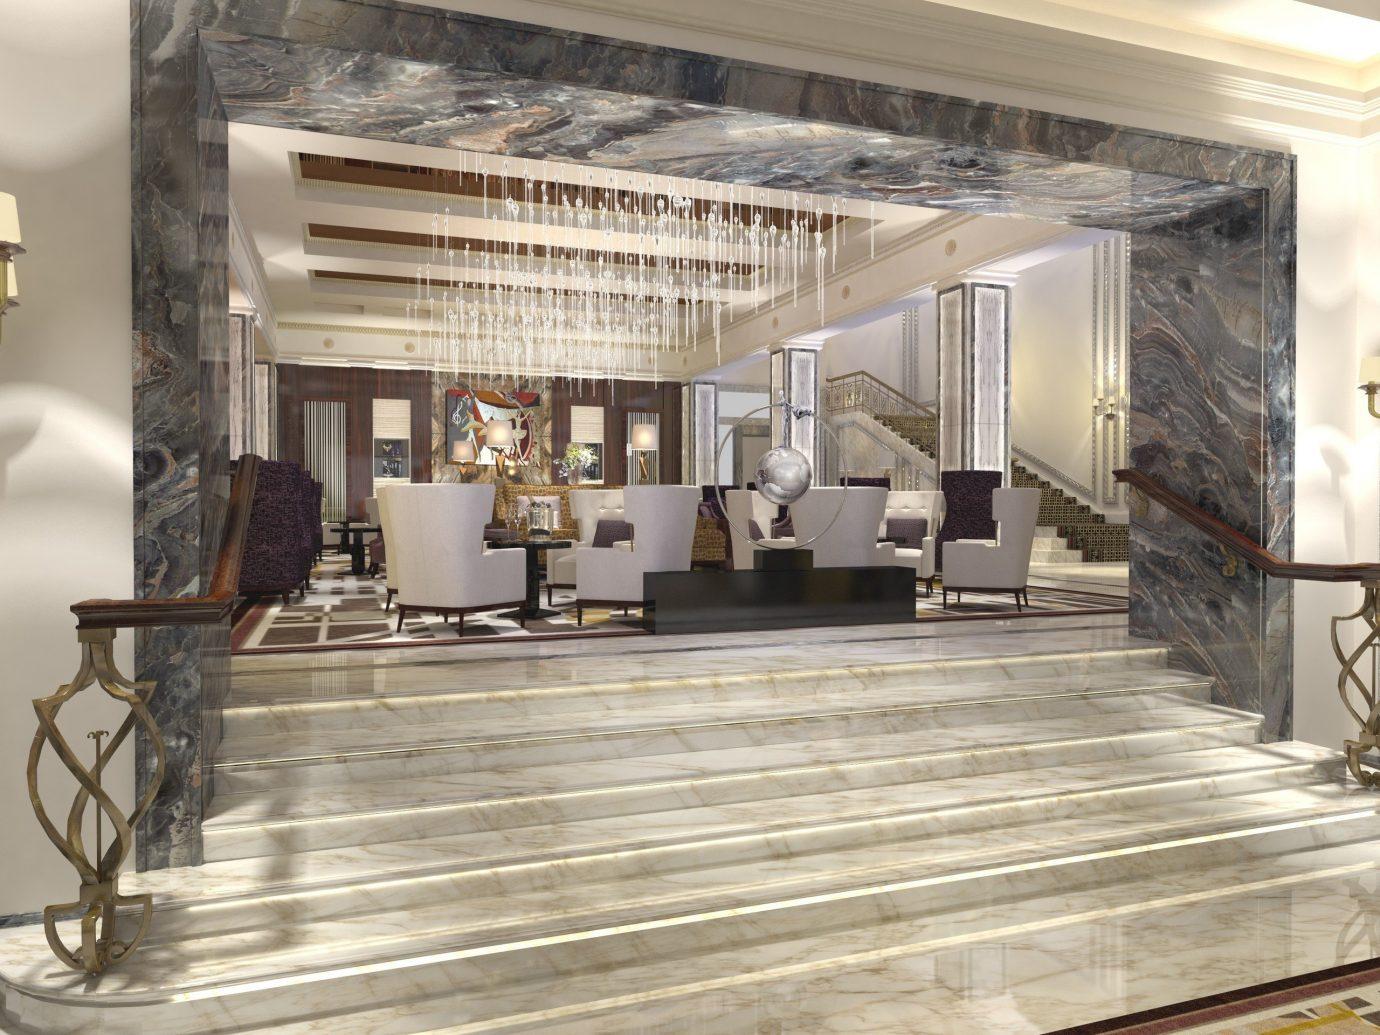 Architecture Fall Travel Hotels Luxury Travel News Trip Ideas indoor Lobby interior design room flooring floor ceiling estate furniture